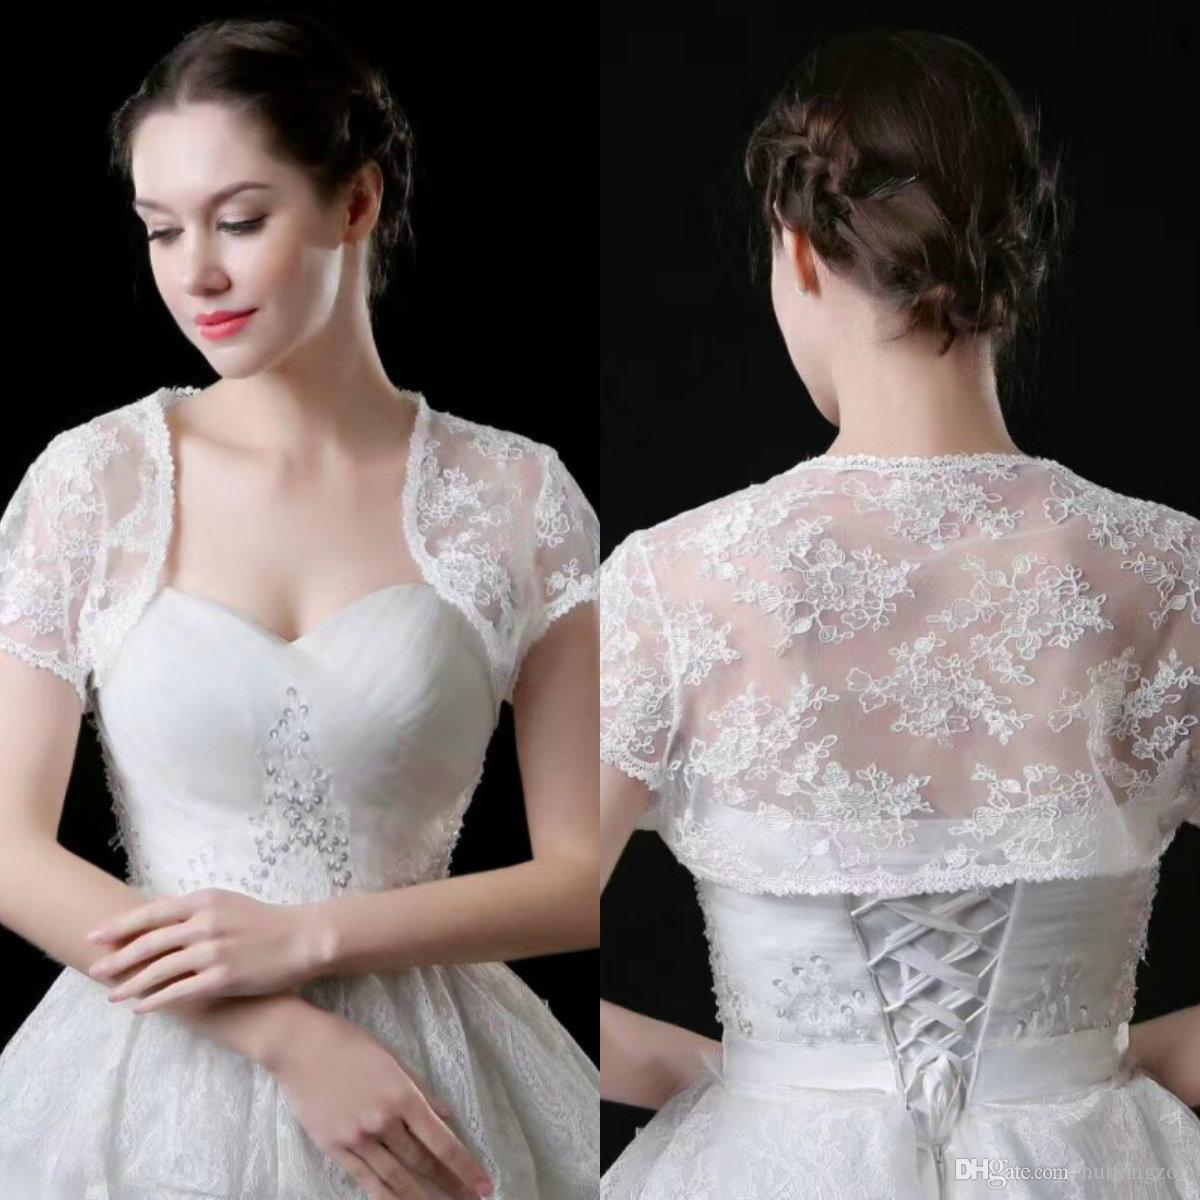 High Quality Bridal Wraps Lace Applique Short Sleeves Sheath Bridal Bolero For Wedding Dresses Custom Made Jacket